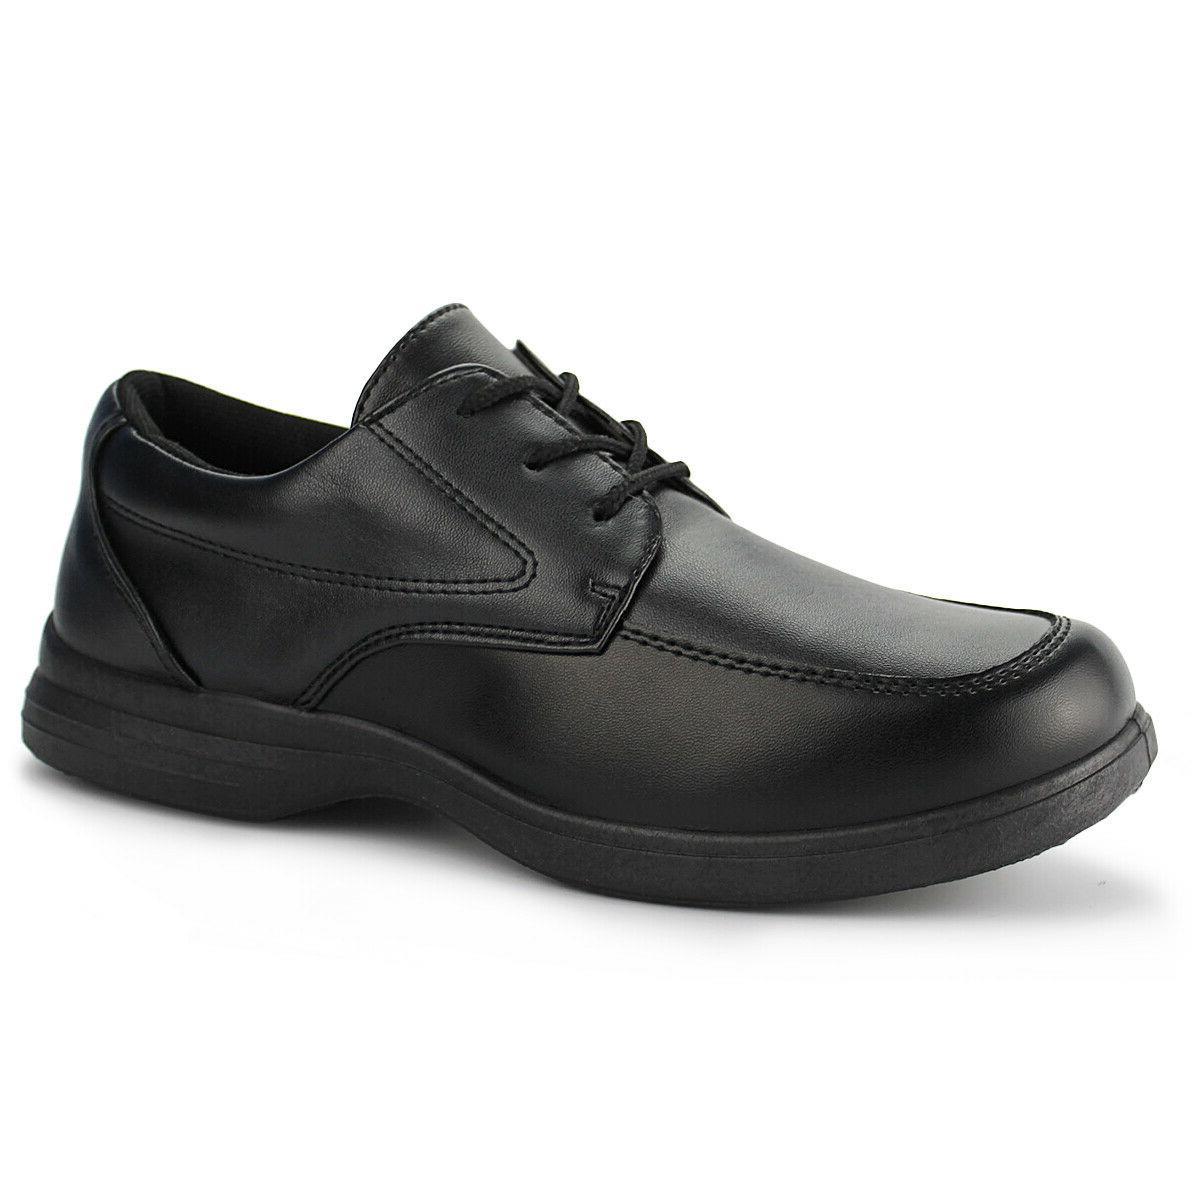 boys black school uniform shoes kids classic